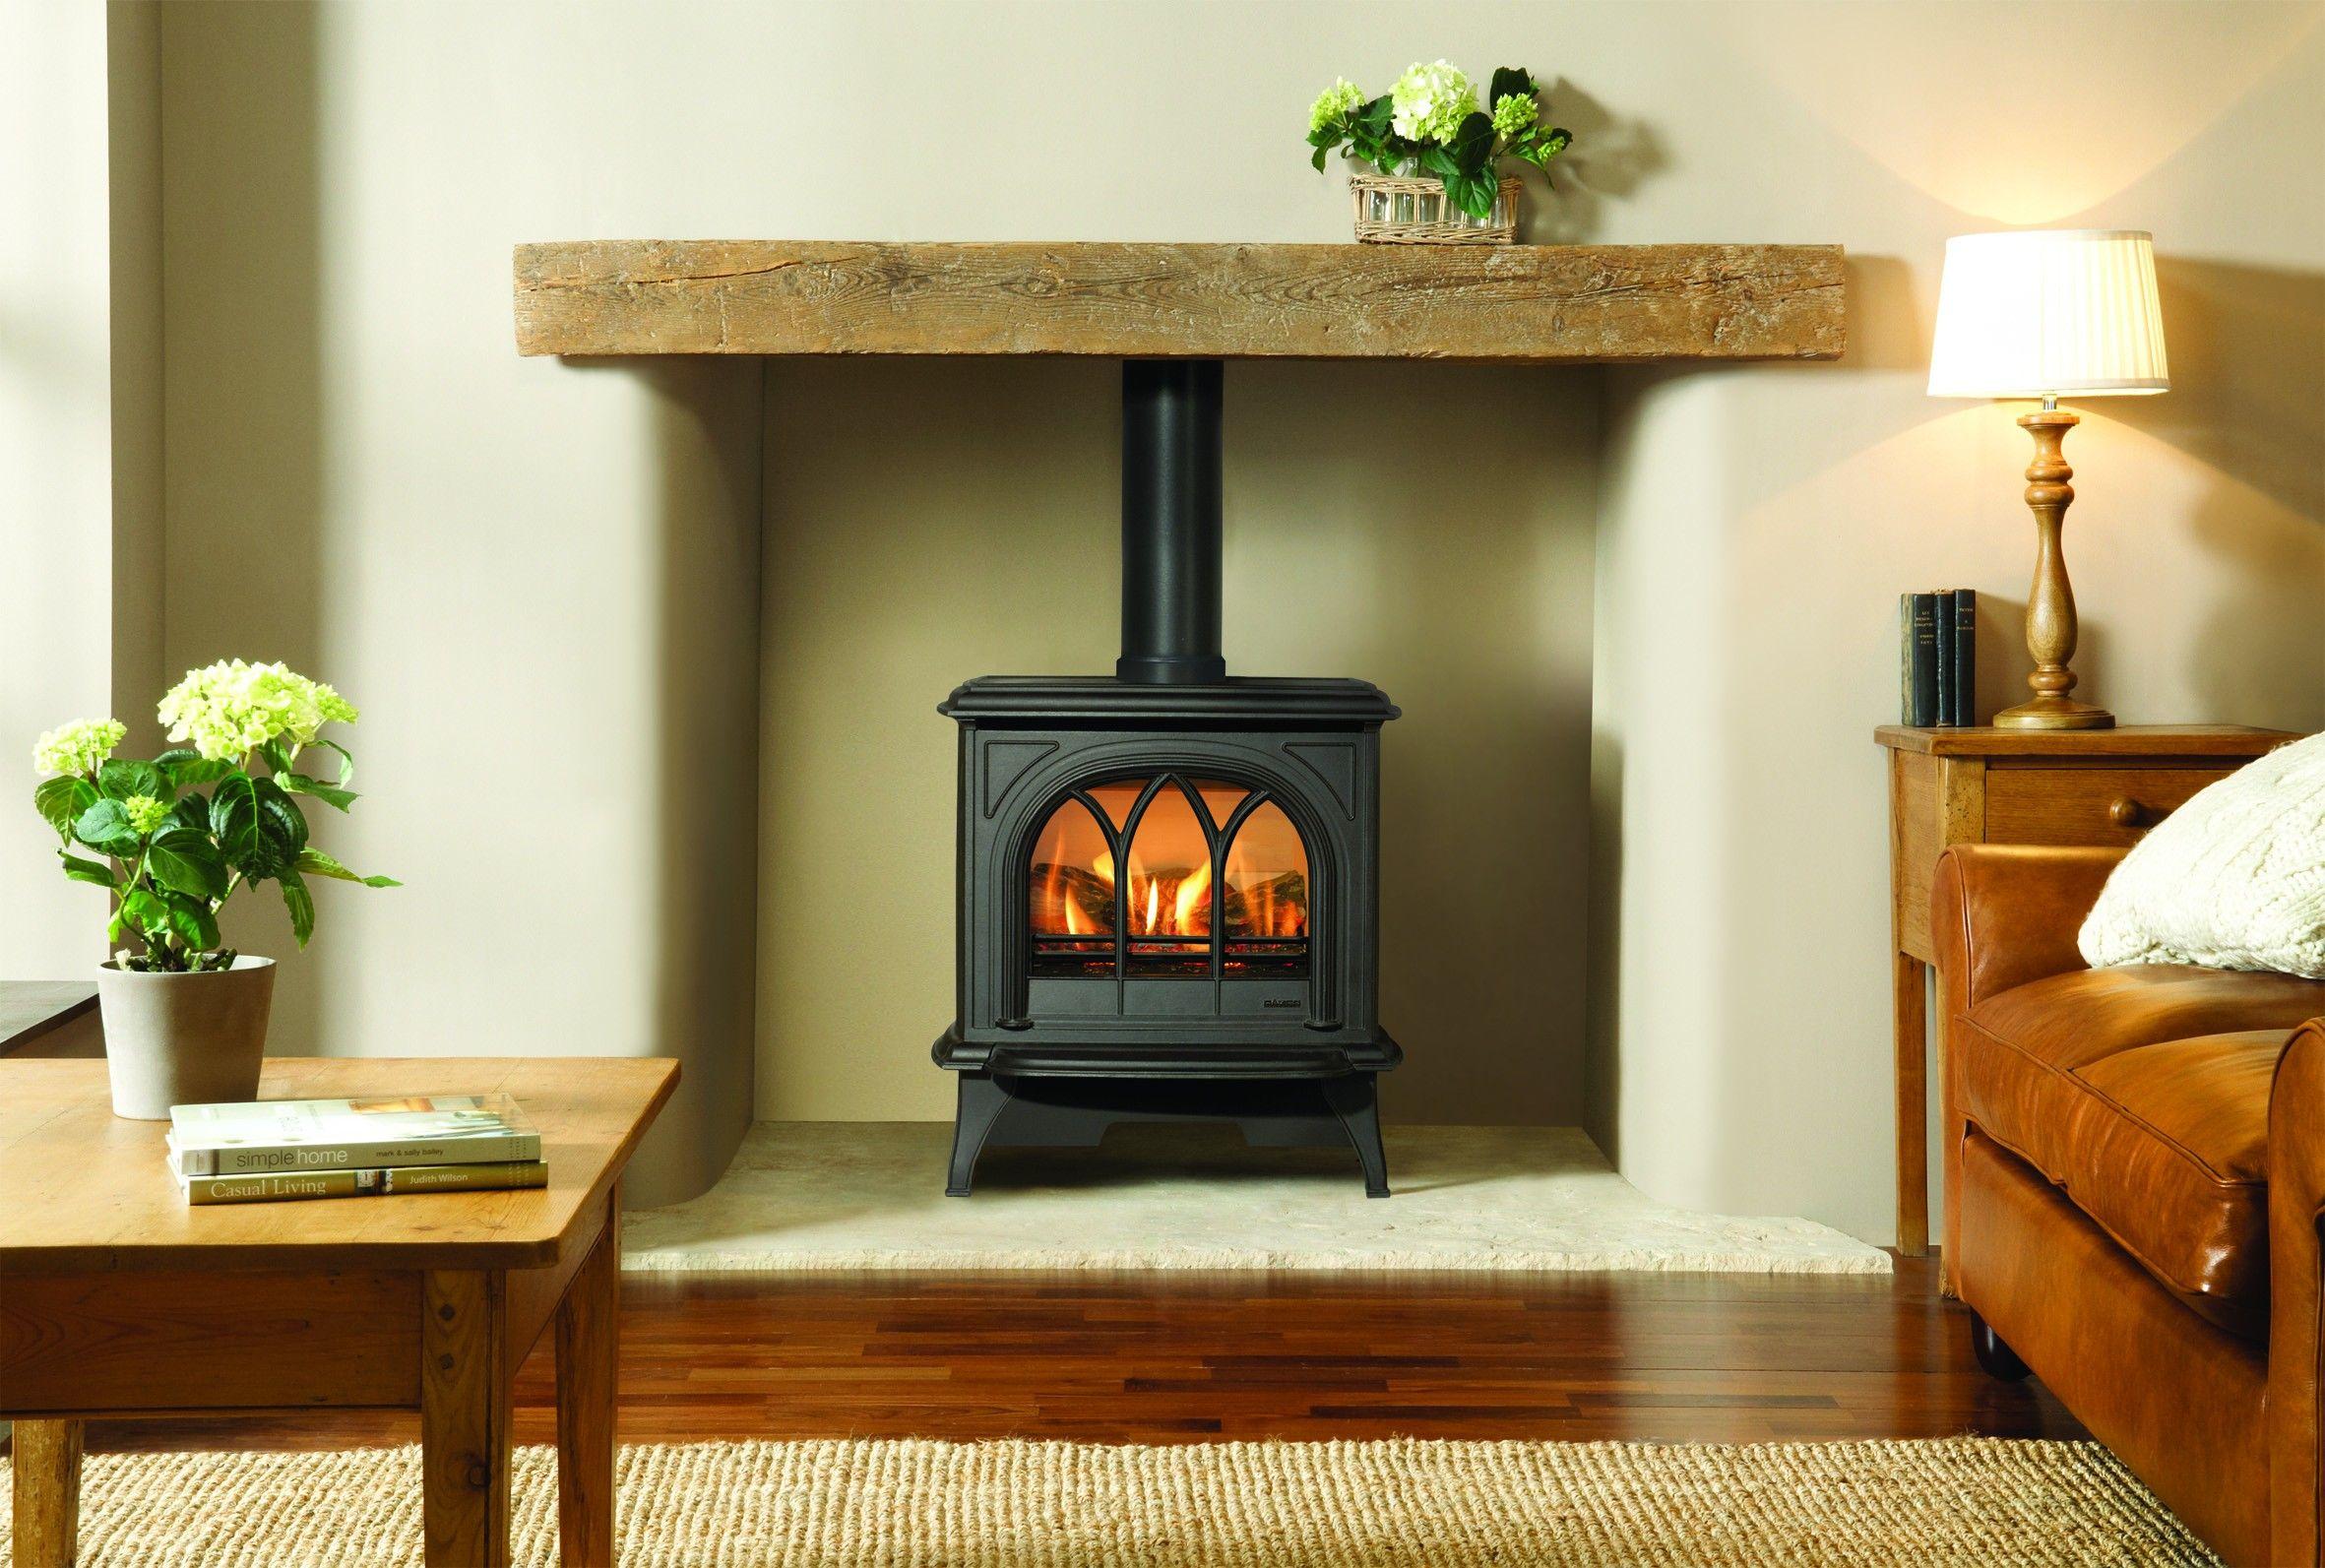 Gazco Huntingdon 30 Wee Perch For Stuff Log Burner Living Room Woodburning Stove Fireplace Freestanding Fireplace